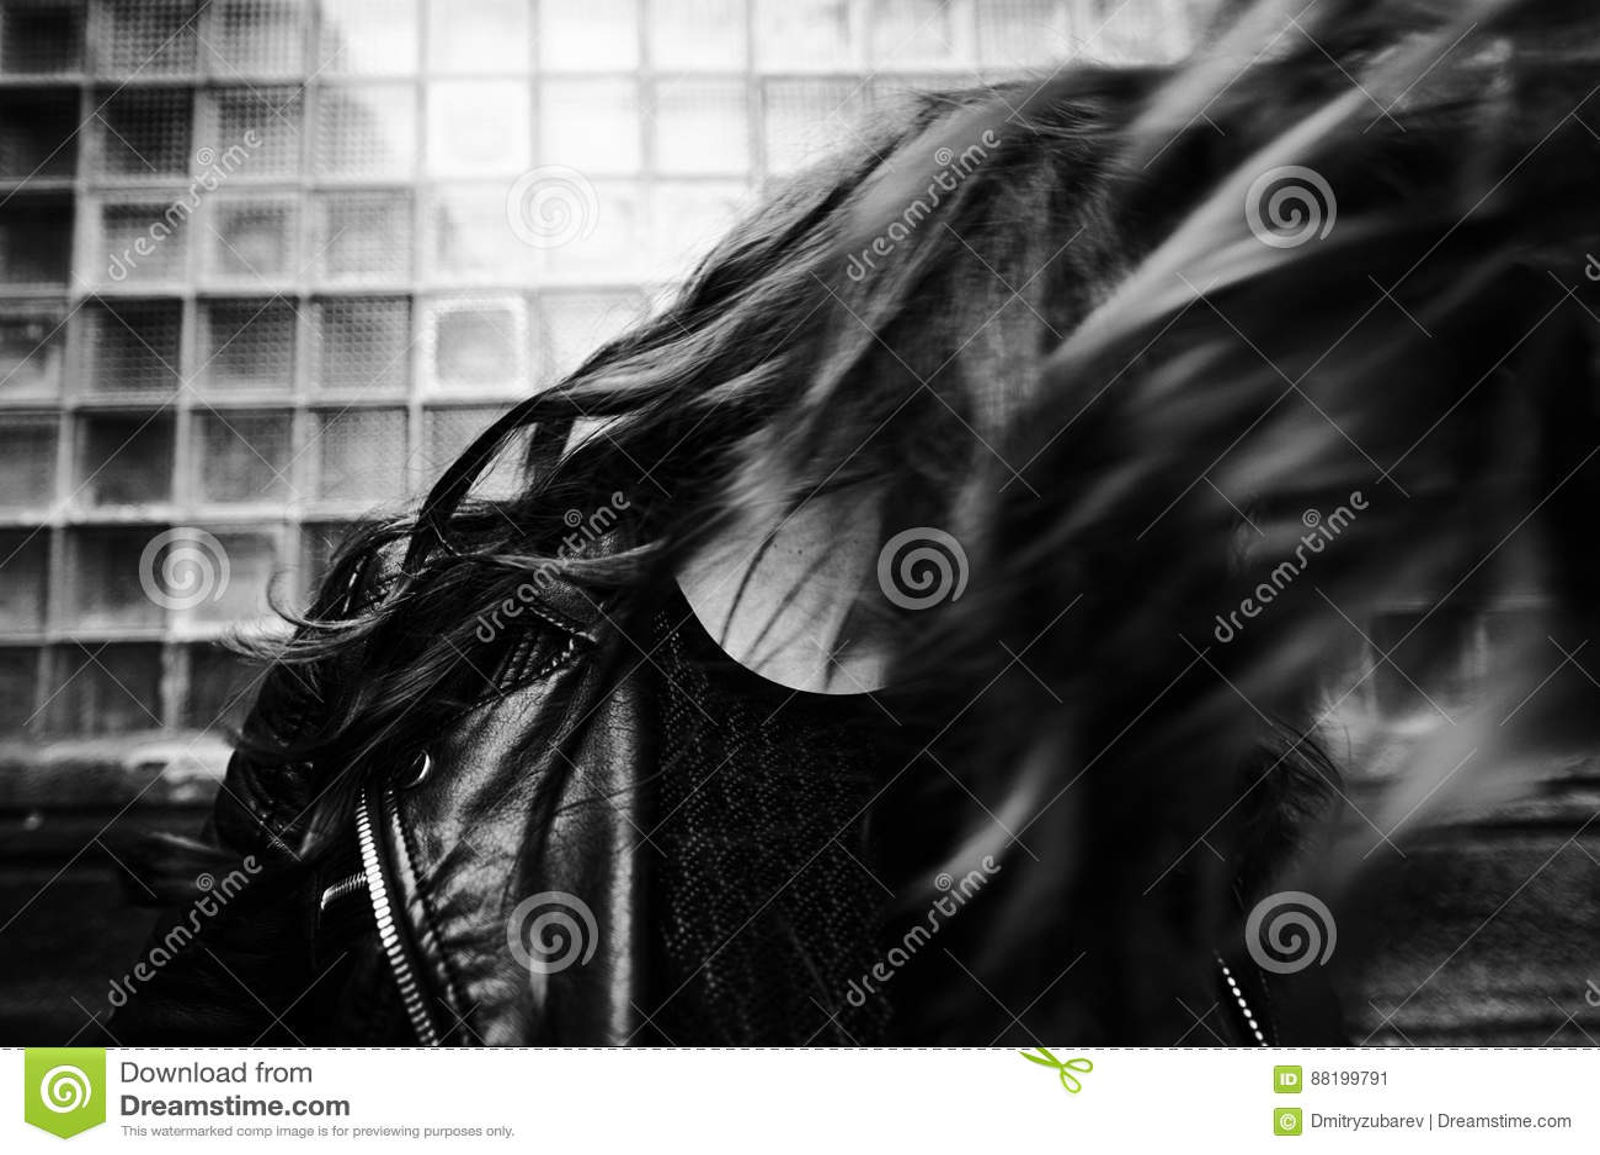 Eastern beautiful woman wearing biker jacket poses in backyard of vintage apartment house